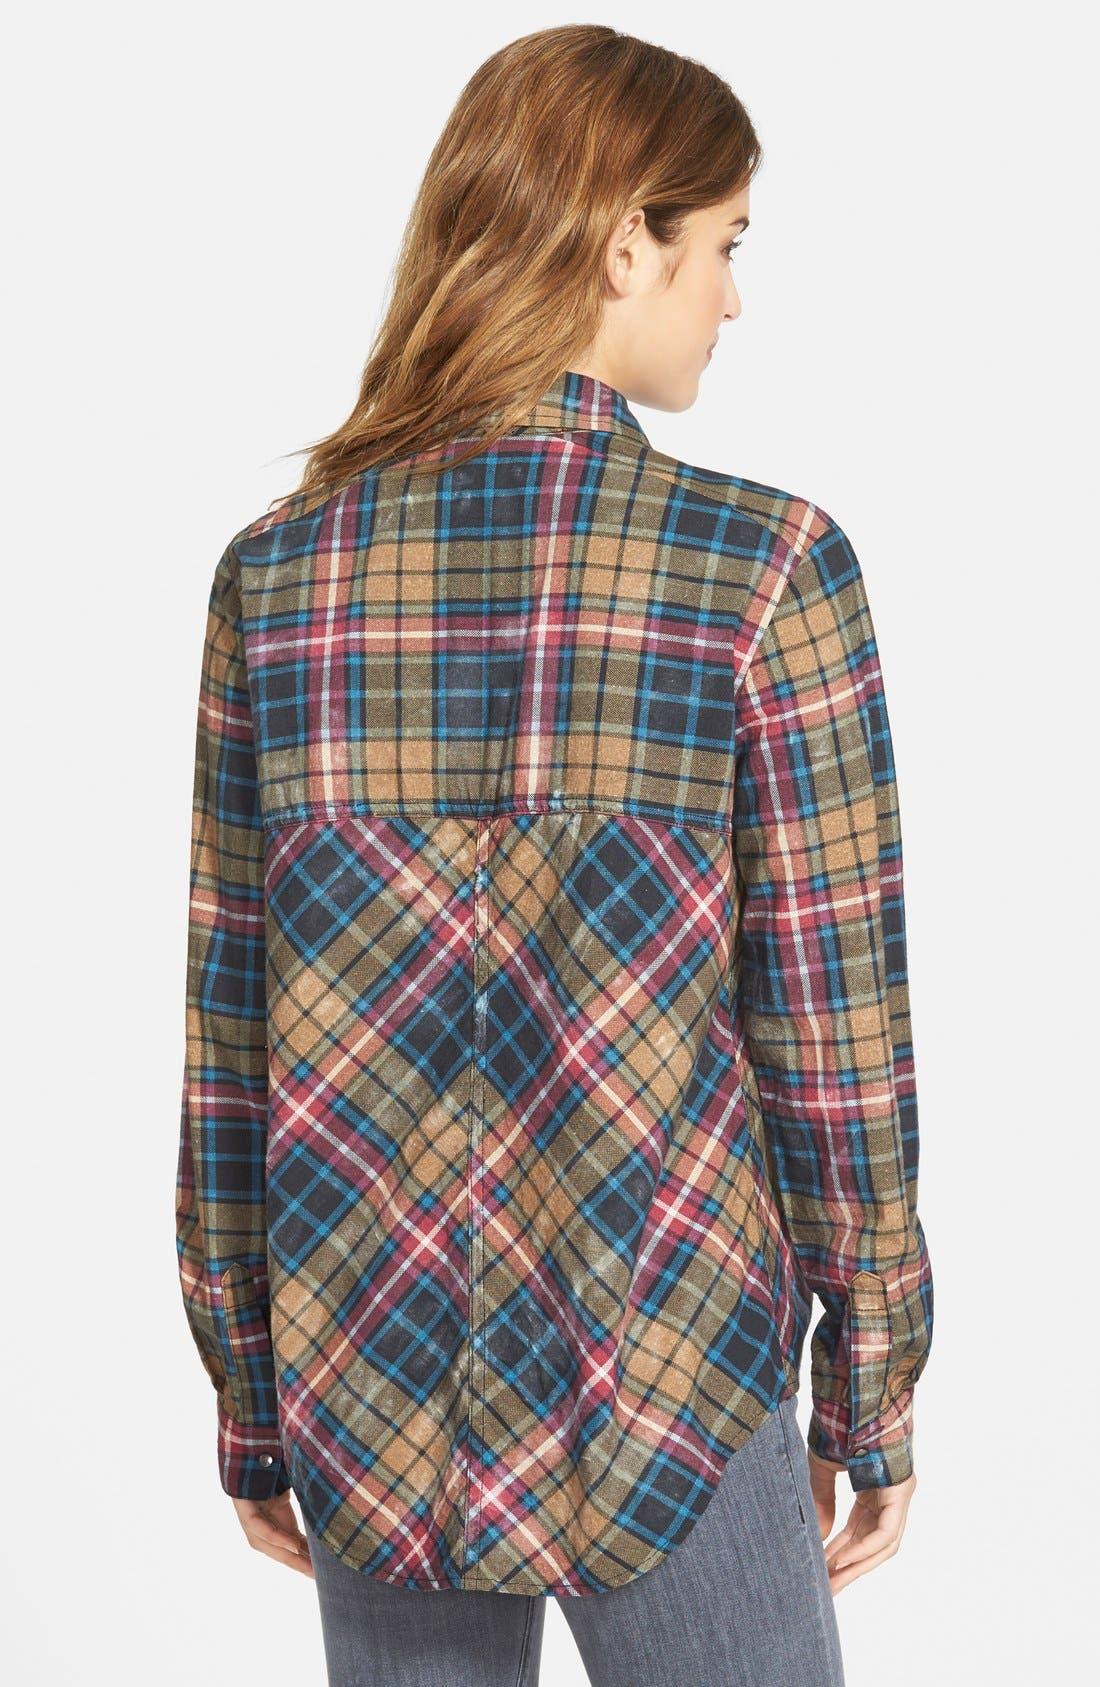 FREE PEOPLE, Stitch Detail Plaid Shirt, Alternate thumbnail 3, color, 300